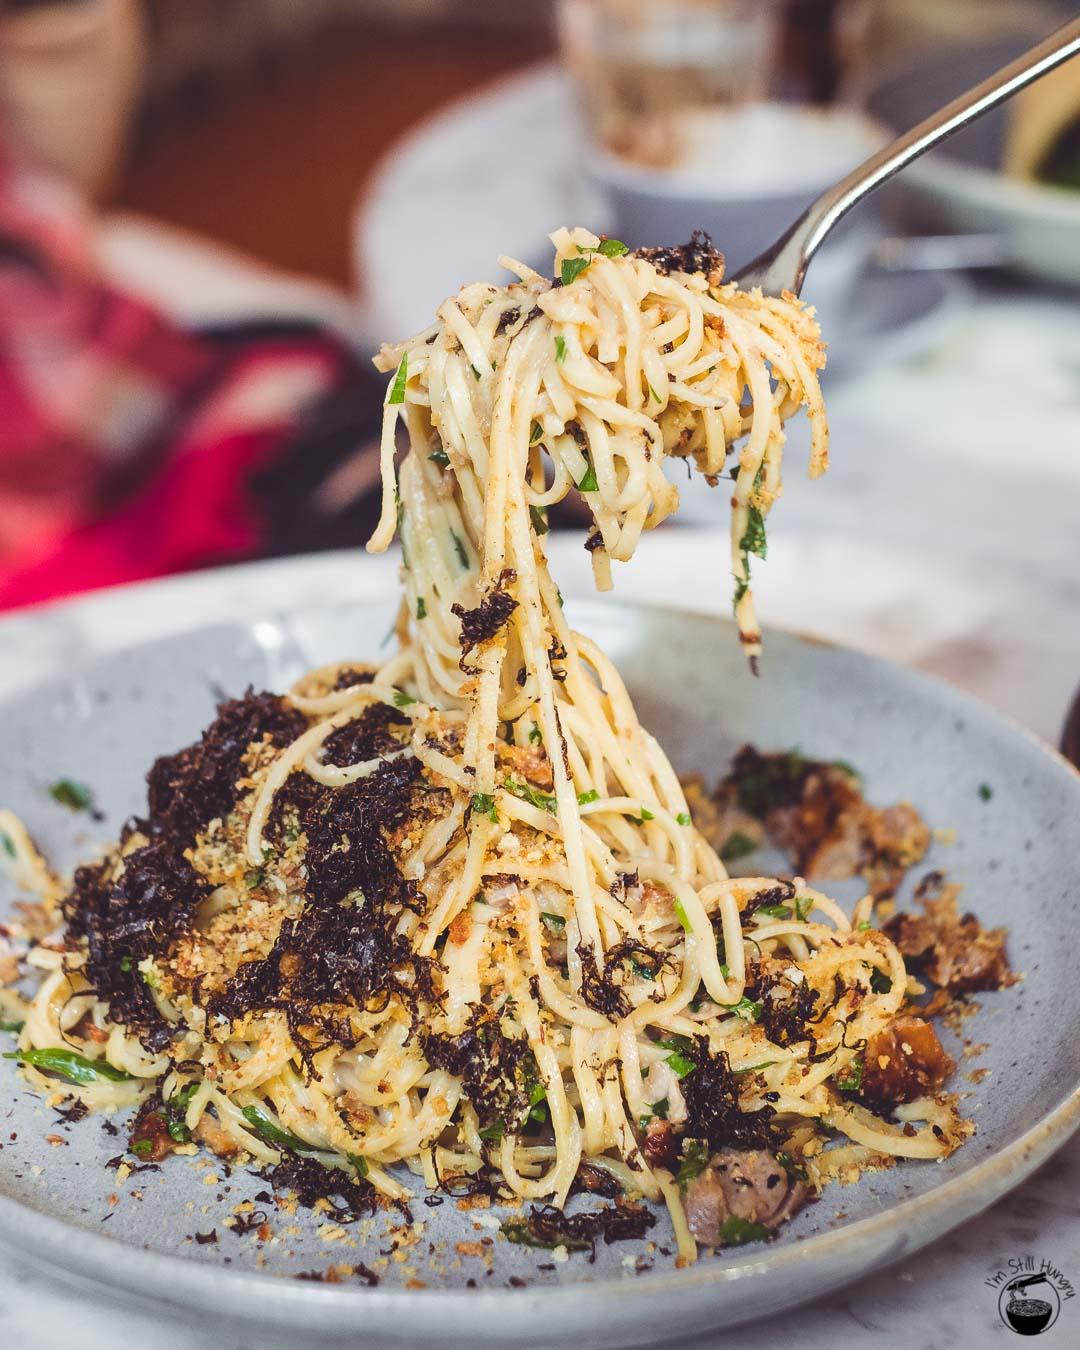 Three Williams Roasted Peking duck angel hair pasta: ginger-infused cream sauce, parsley, shaved truffle, fried onion crumb